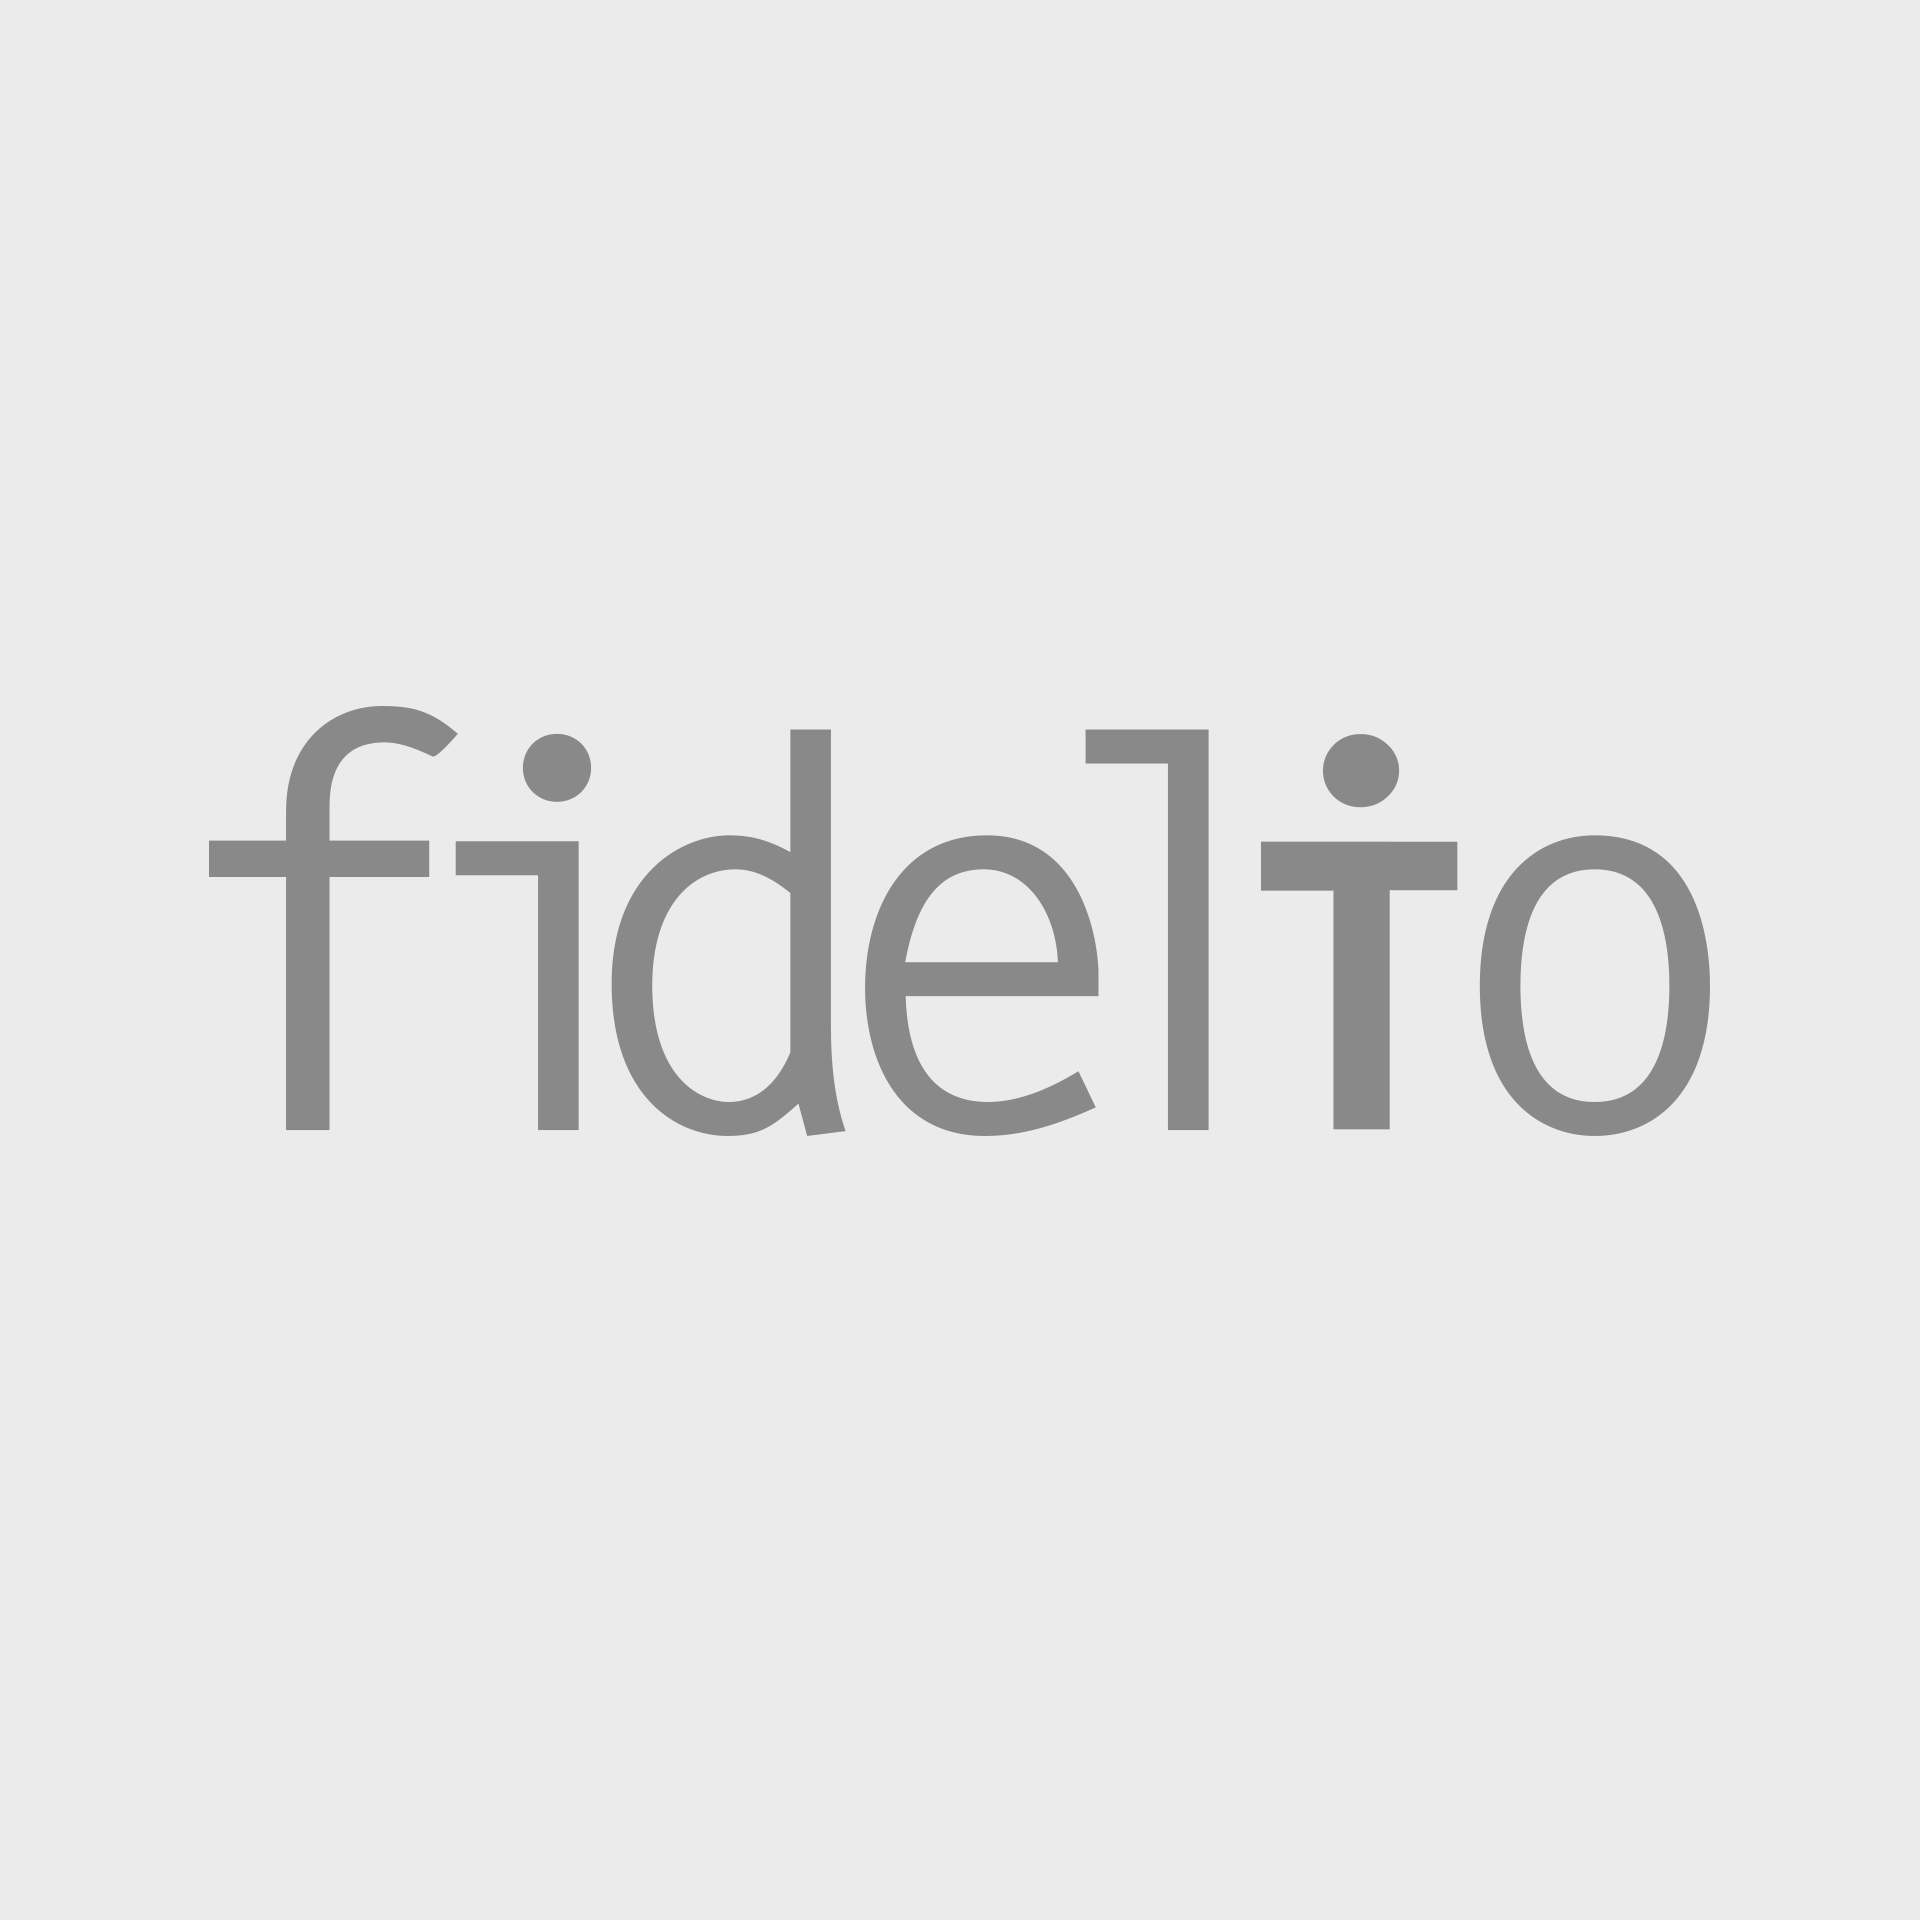 fidelio fektetett